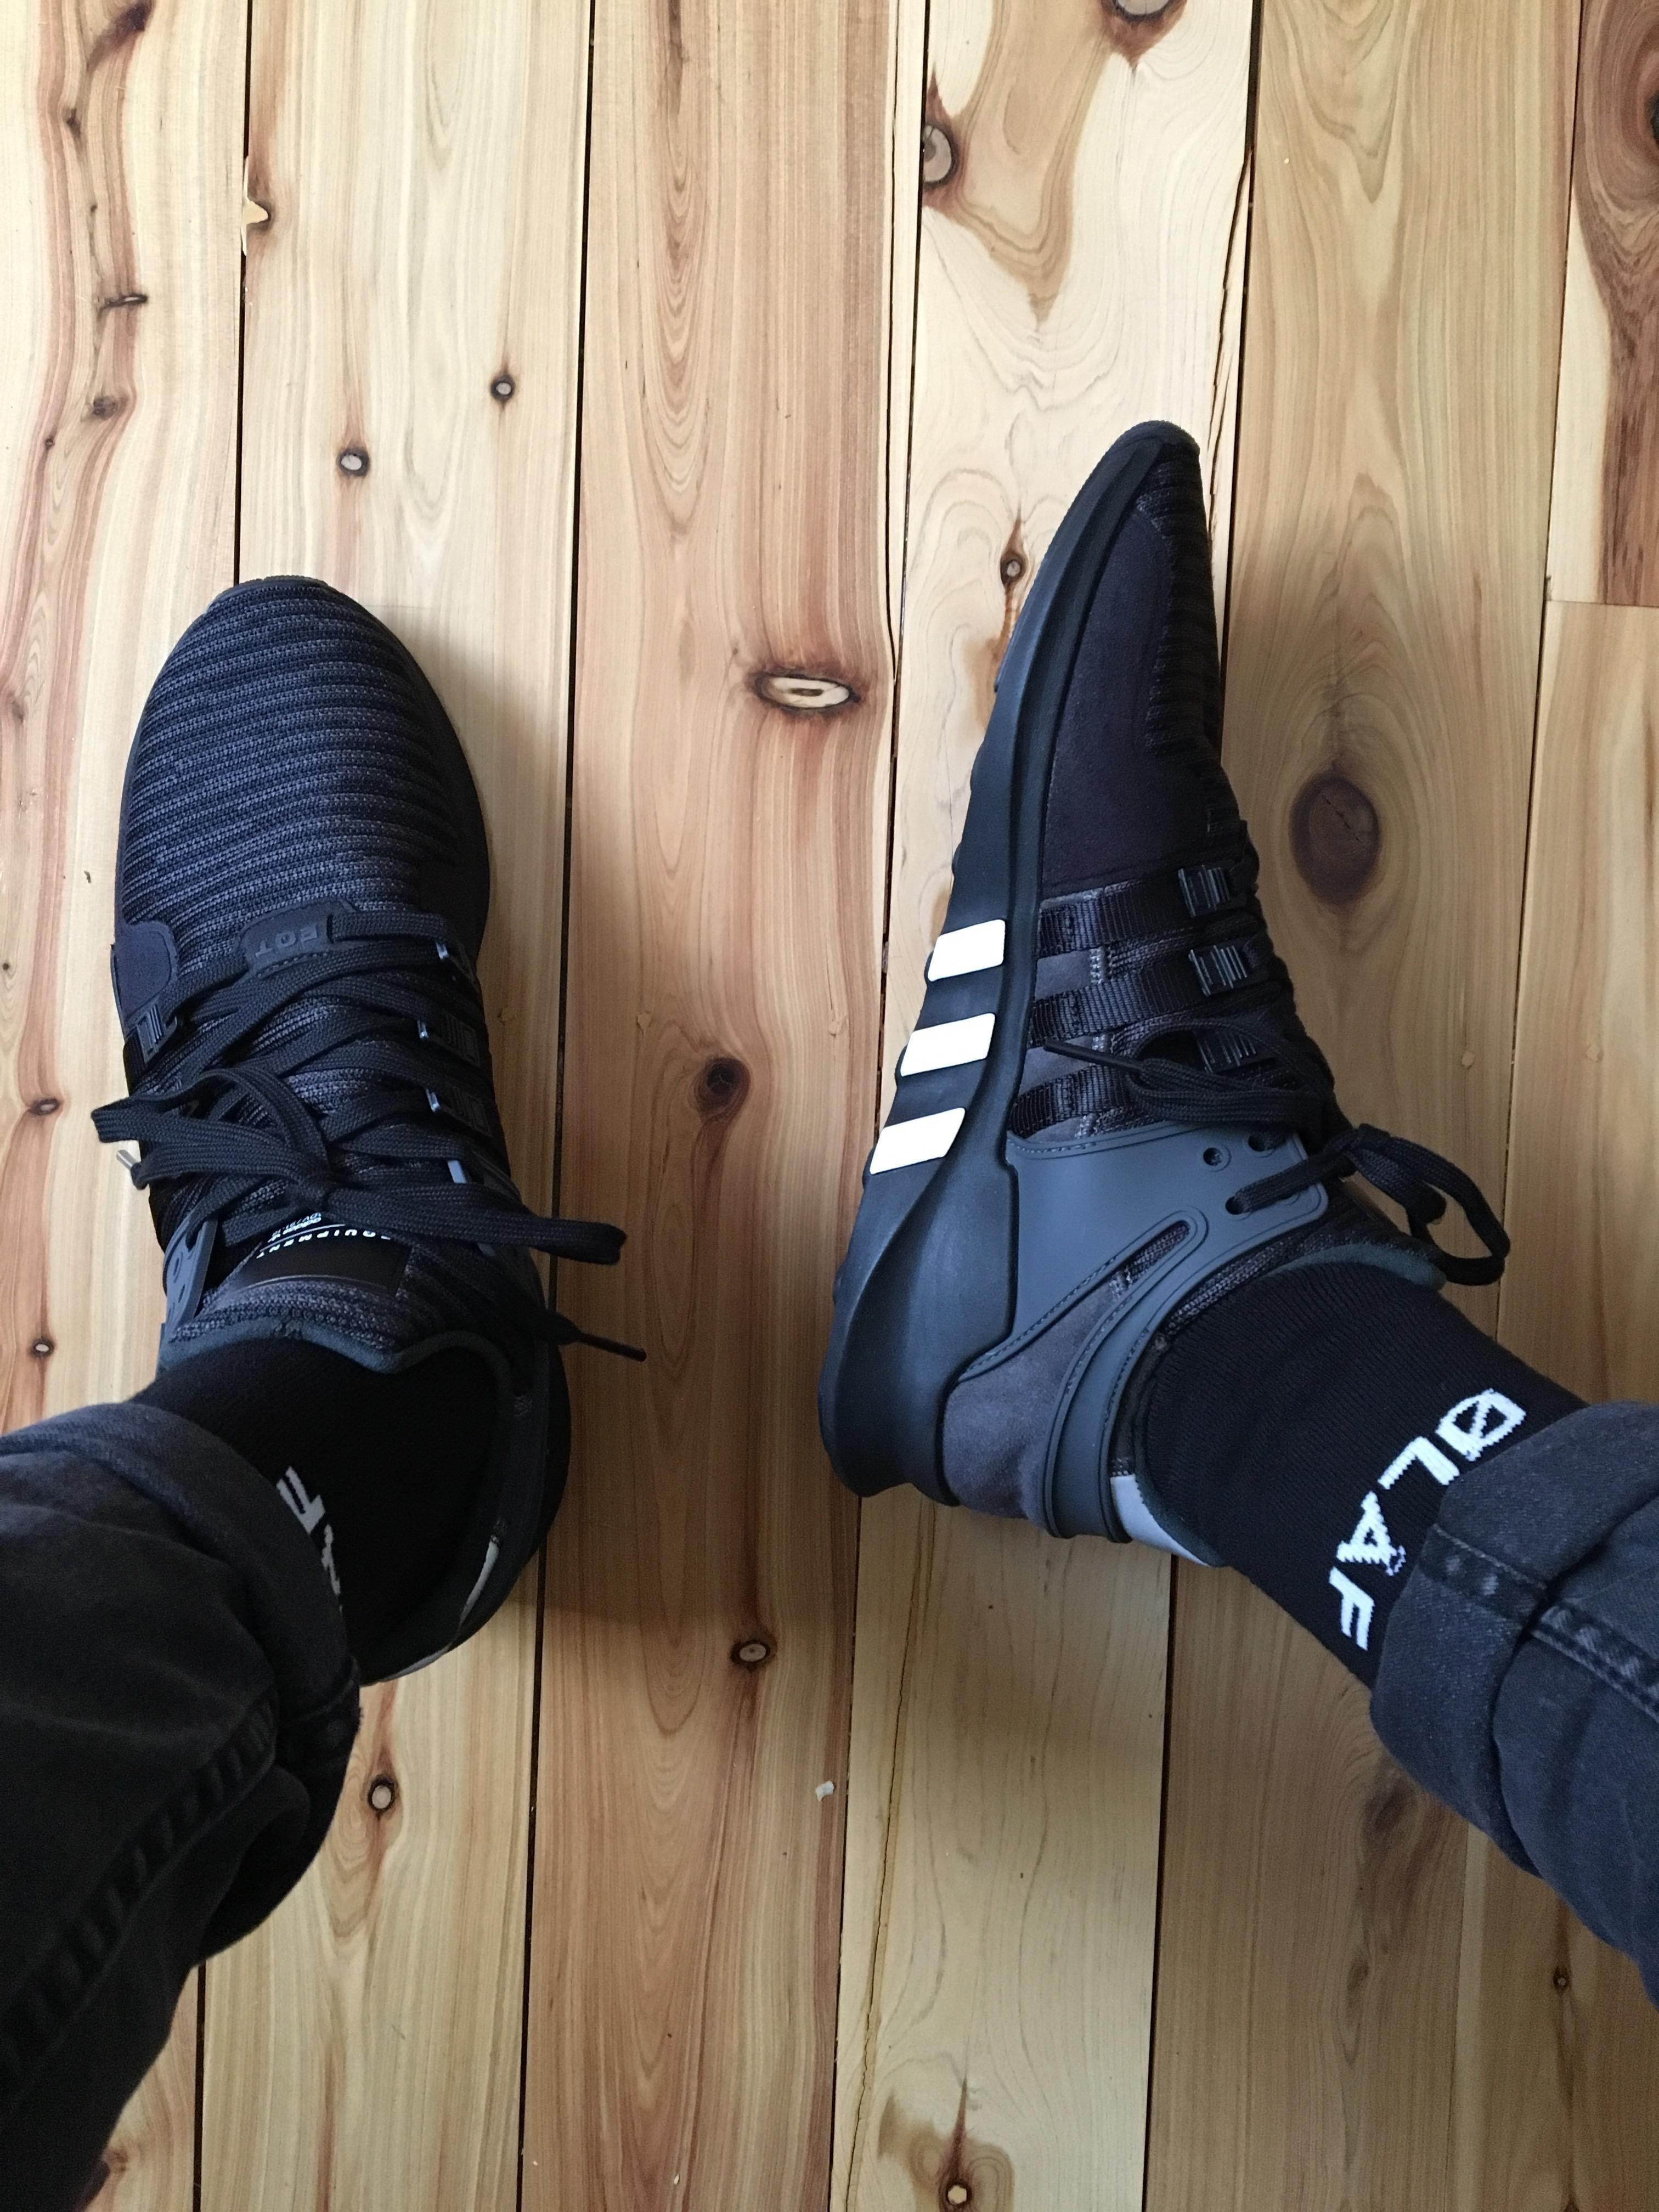 pickup] Adidas EQT Support ADV - Black Solid Grey -#shoesmen #men ...